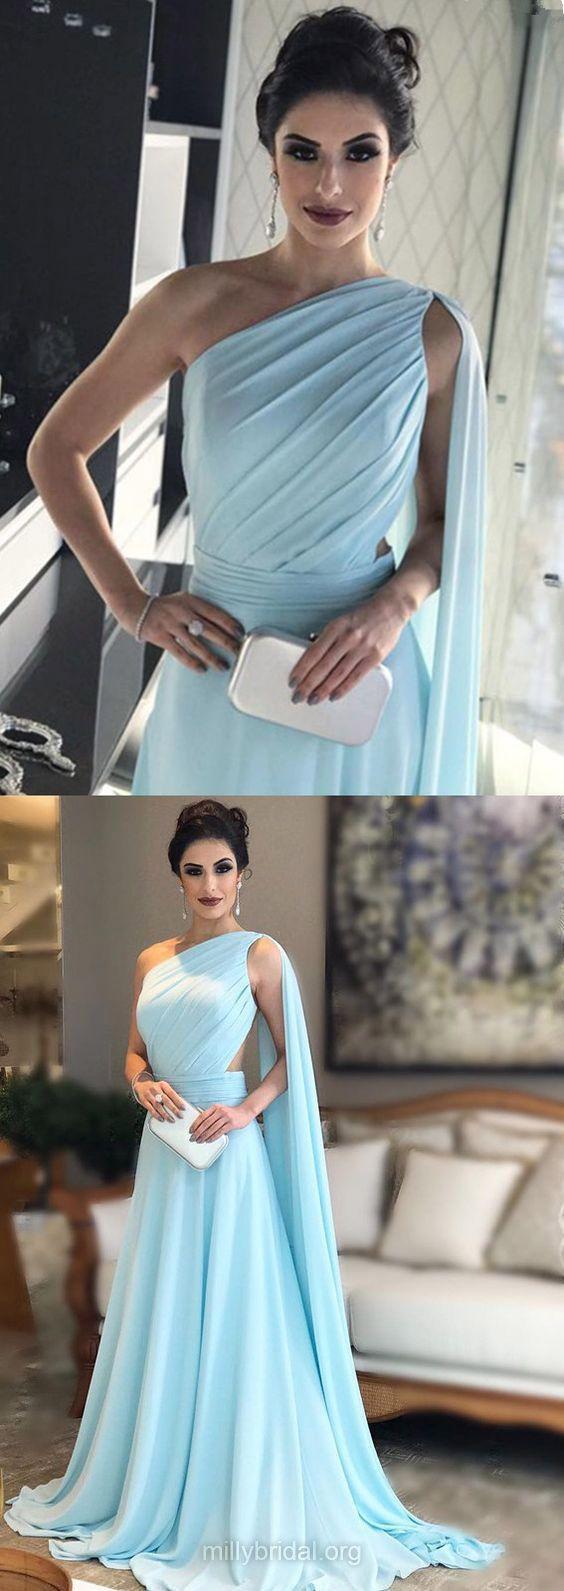 Blue Prom Dresses, Long Prom Dresses, A-line Prom Dresses One Shoulder, Chiffon Formal Evening Dresses Ruffles Modest #eveningdresses